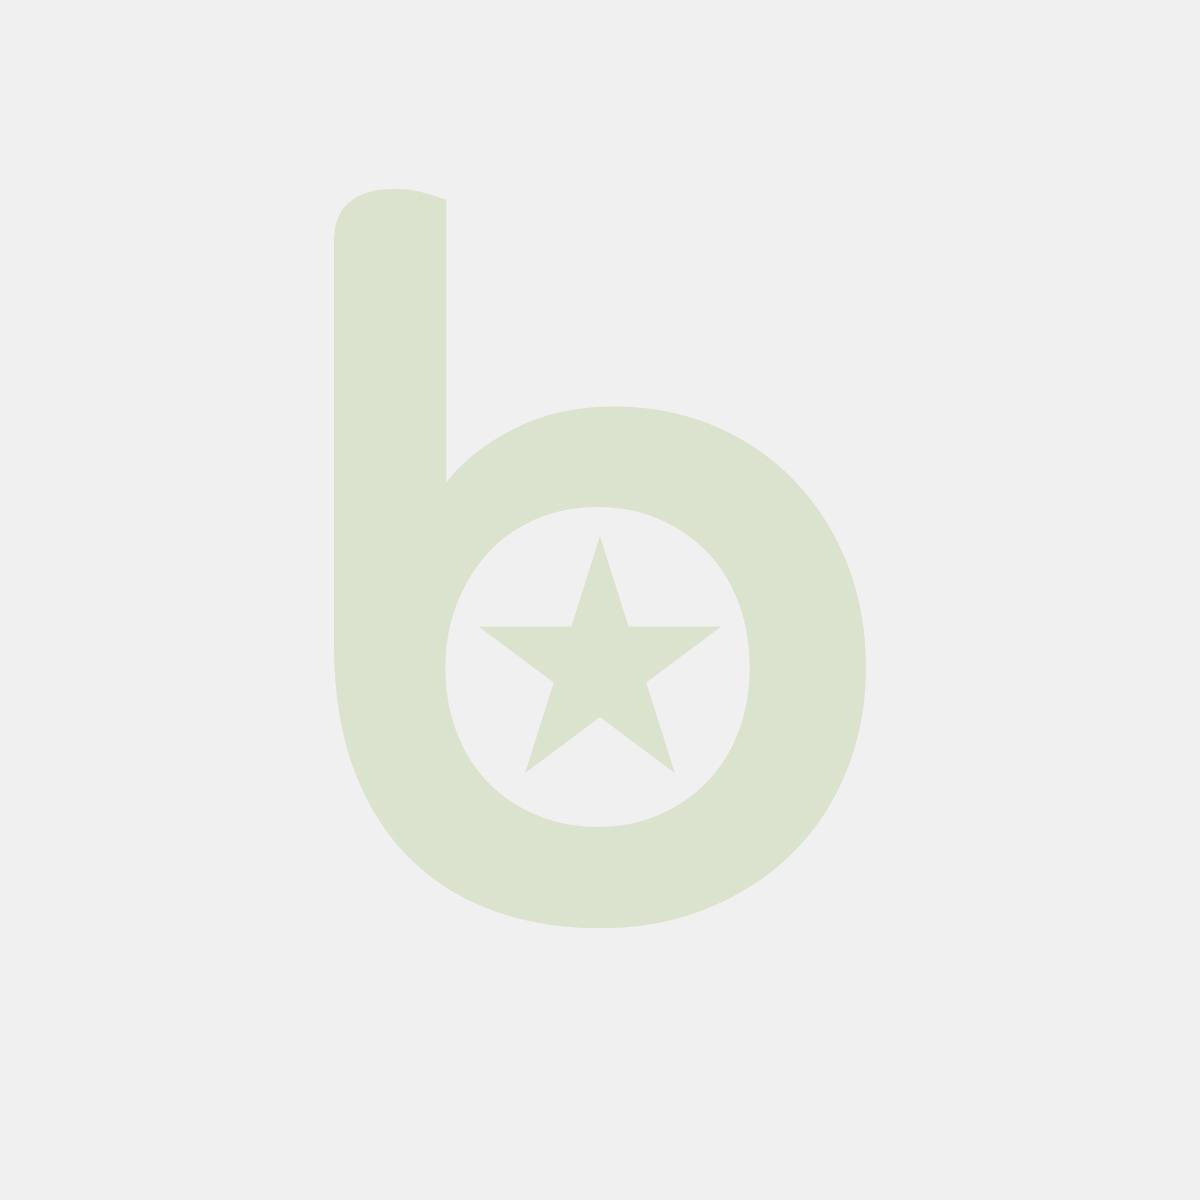 FINGERFOOD - BIO kubek BAMBOO 60ml PLA, transparent fi.4,3x h.8cm 100% biodegradowalne op. 25 sztuk